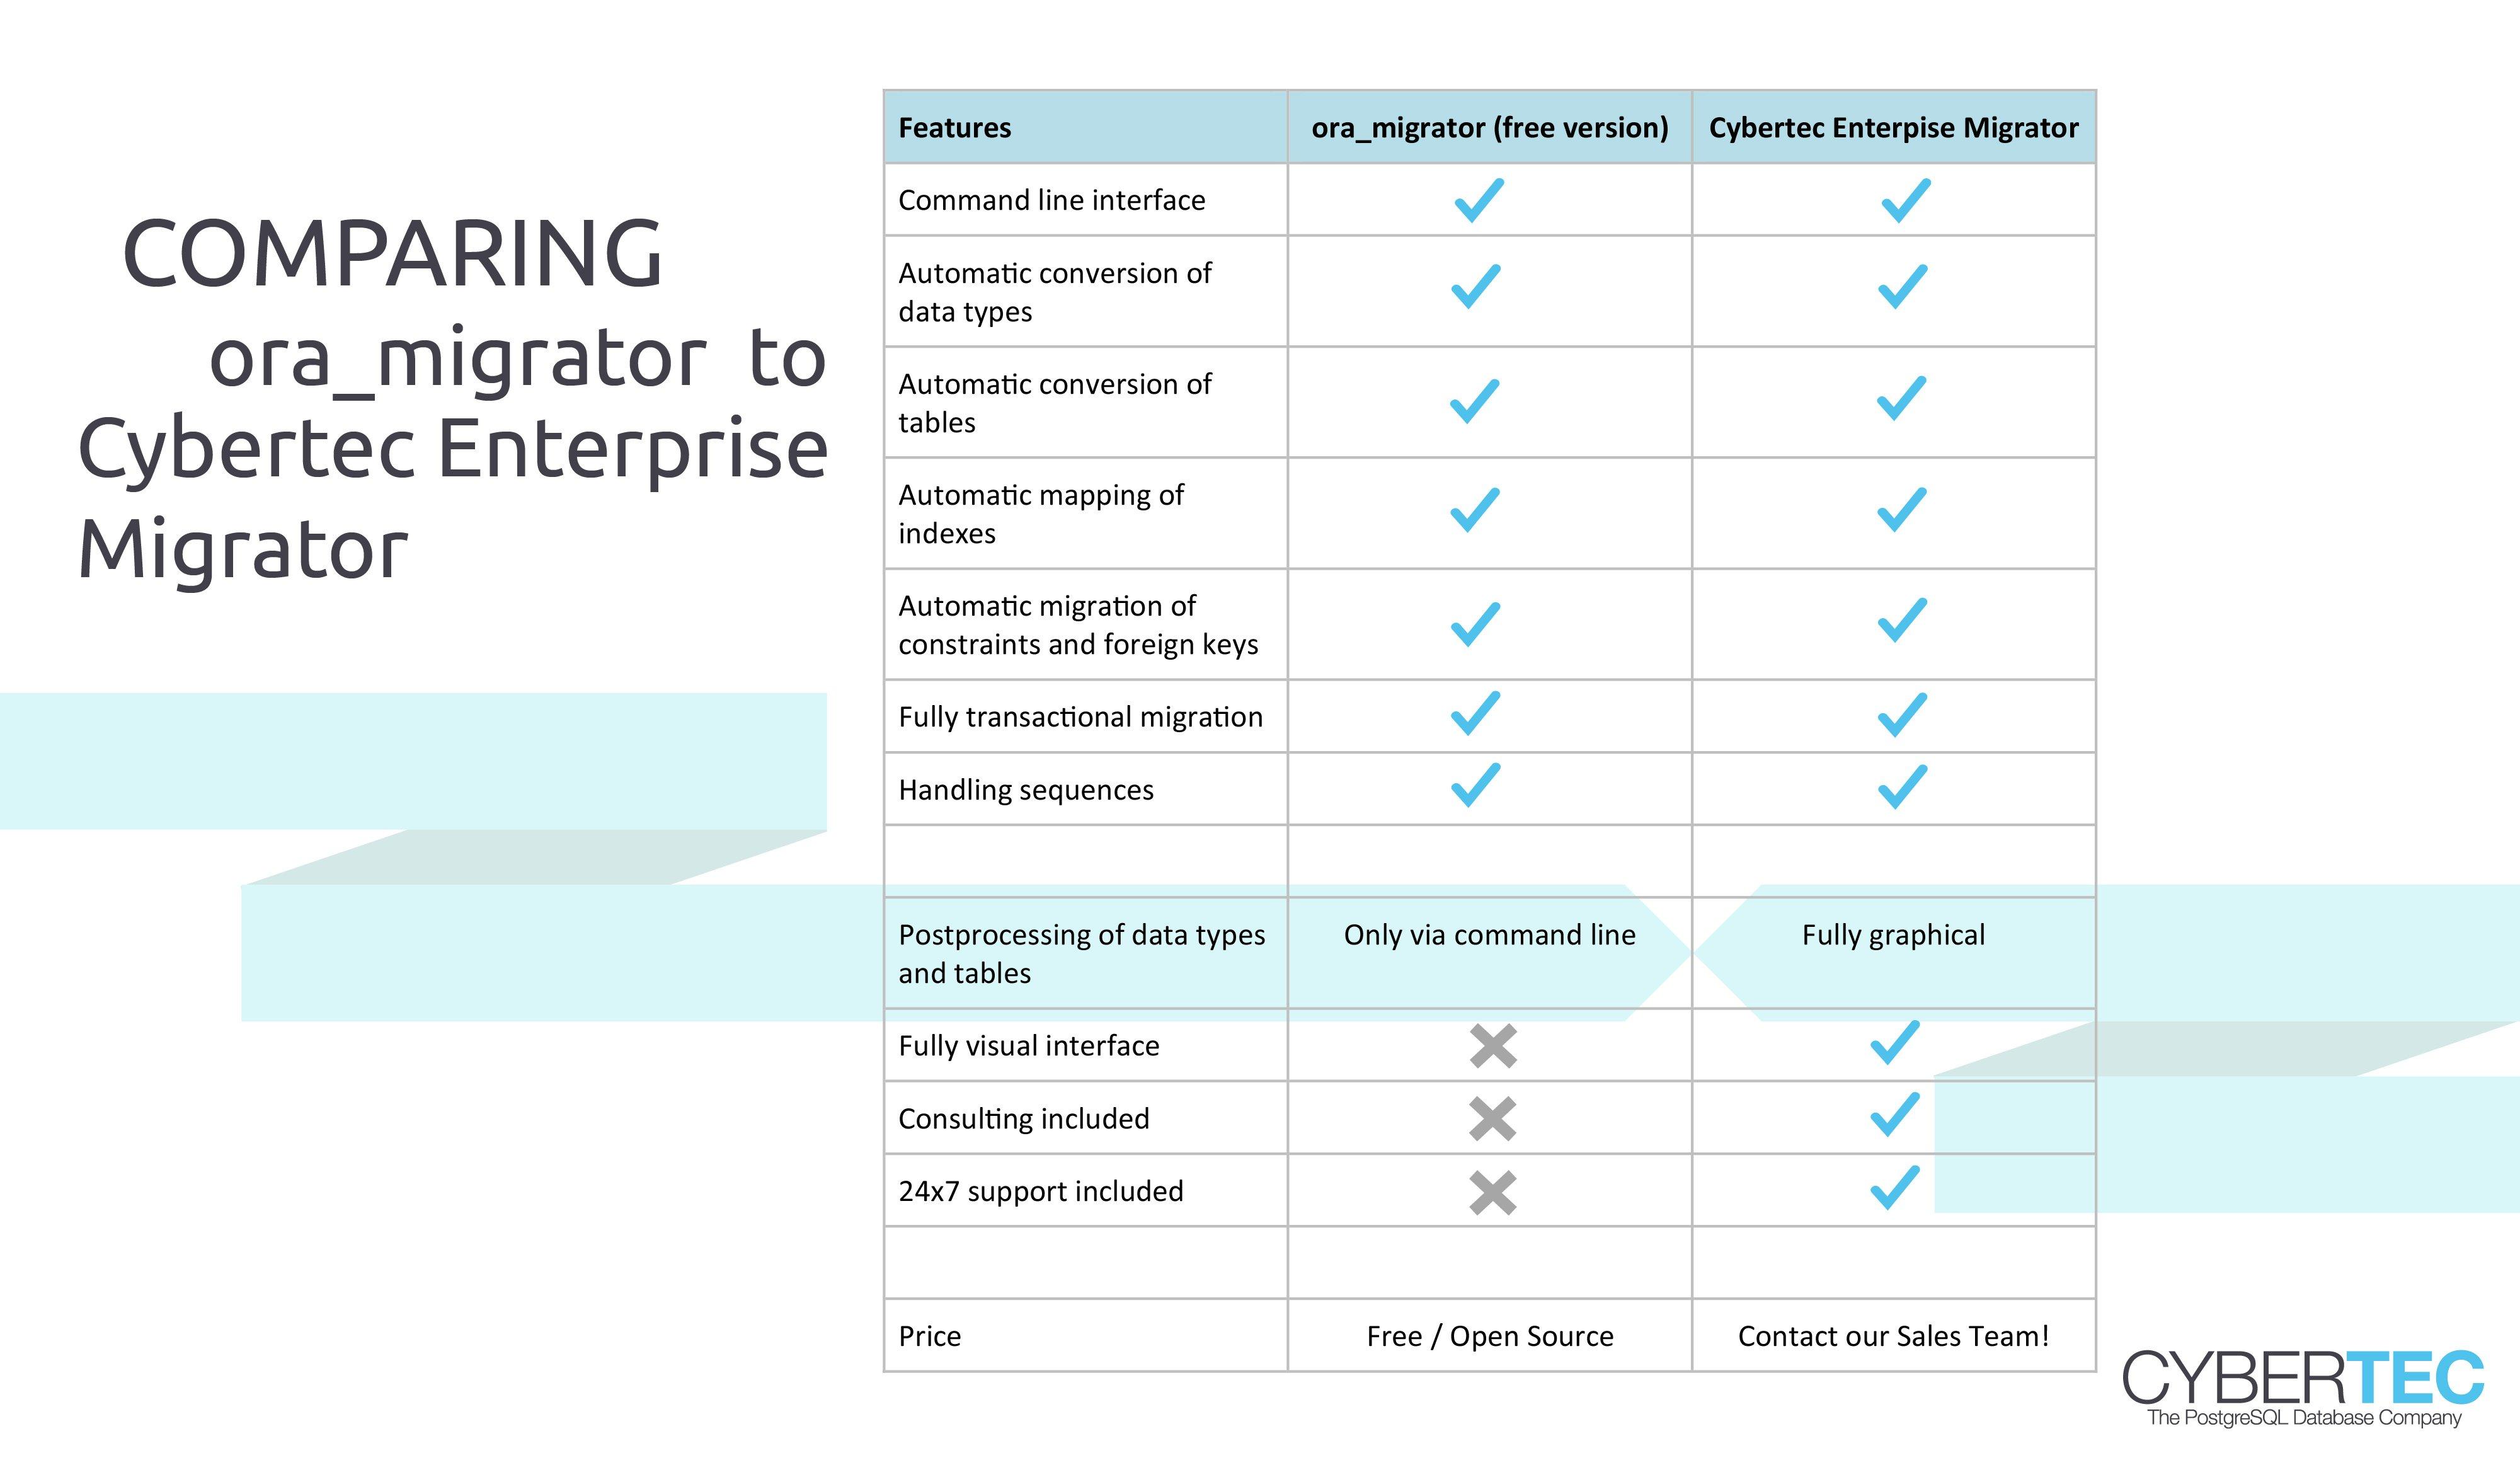 Vergleich Ora Migrator und Enterprises Migrator